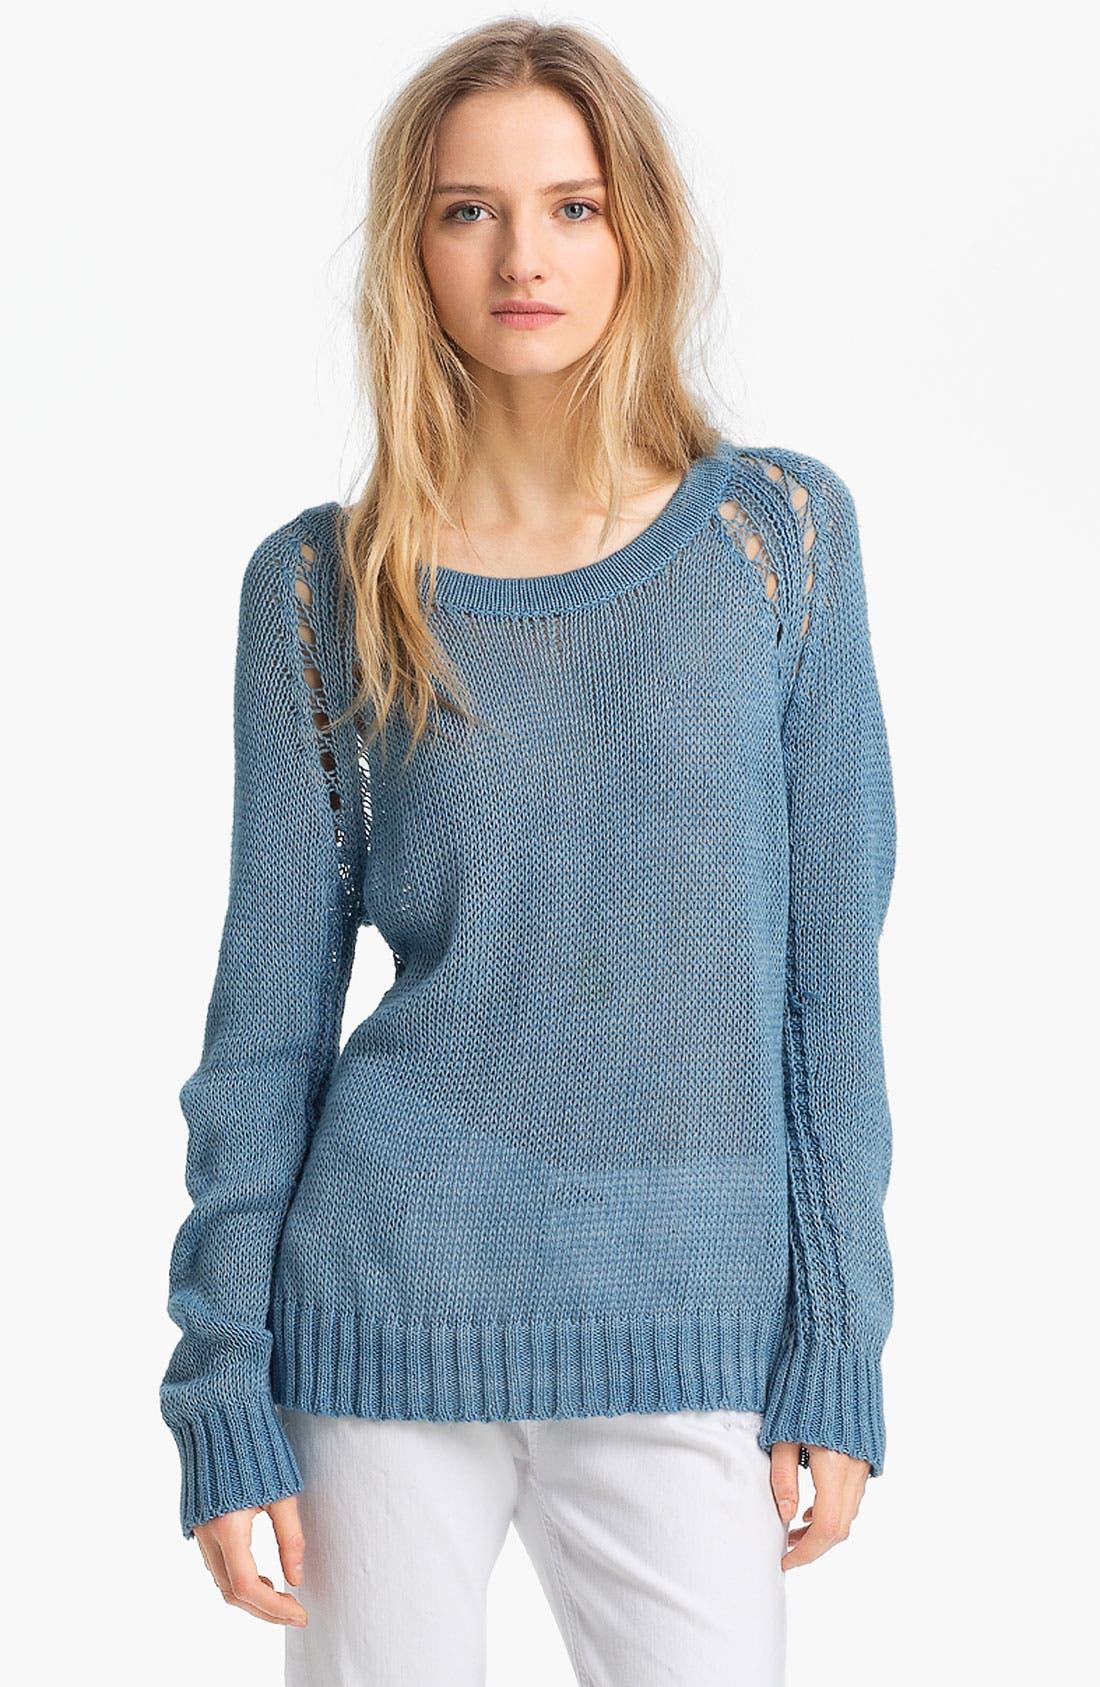 Alternate Image 1 Selected - rag & bone/JEAN 'Bay' Sweater